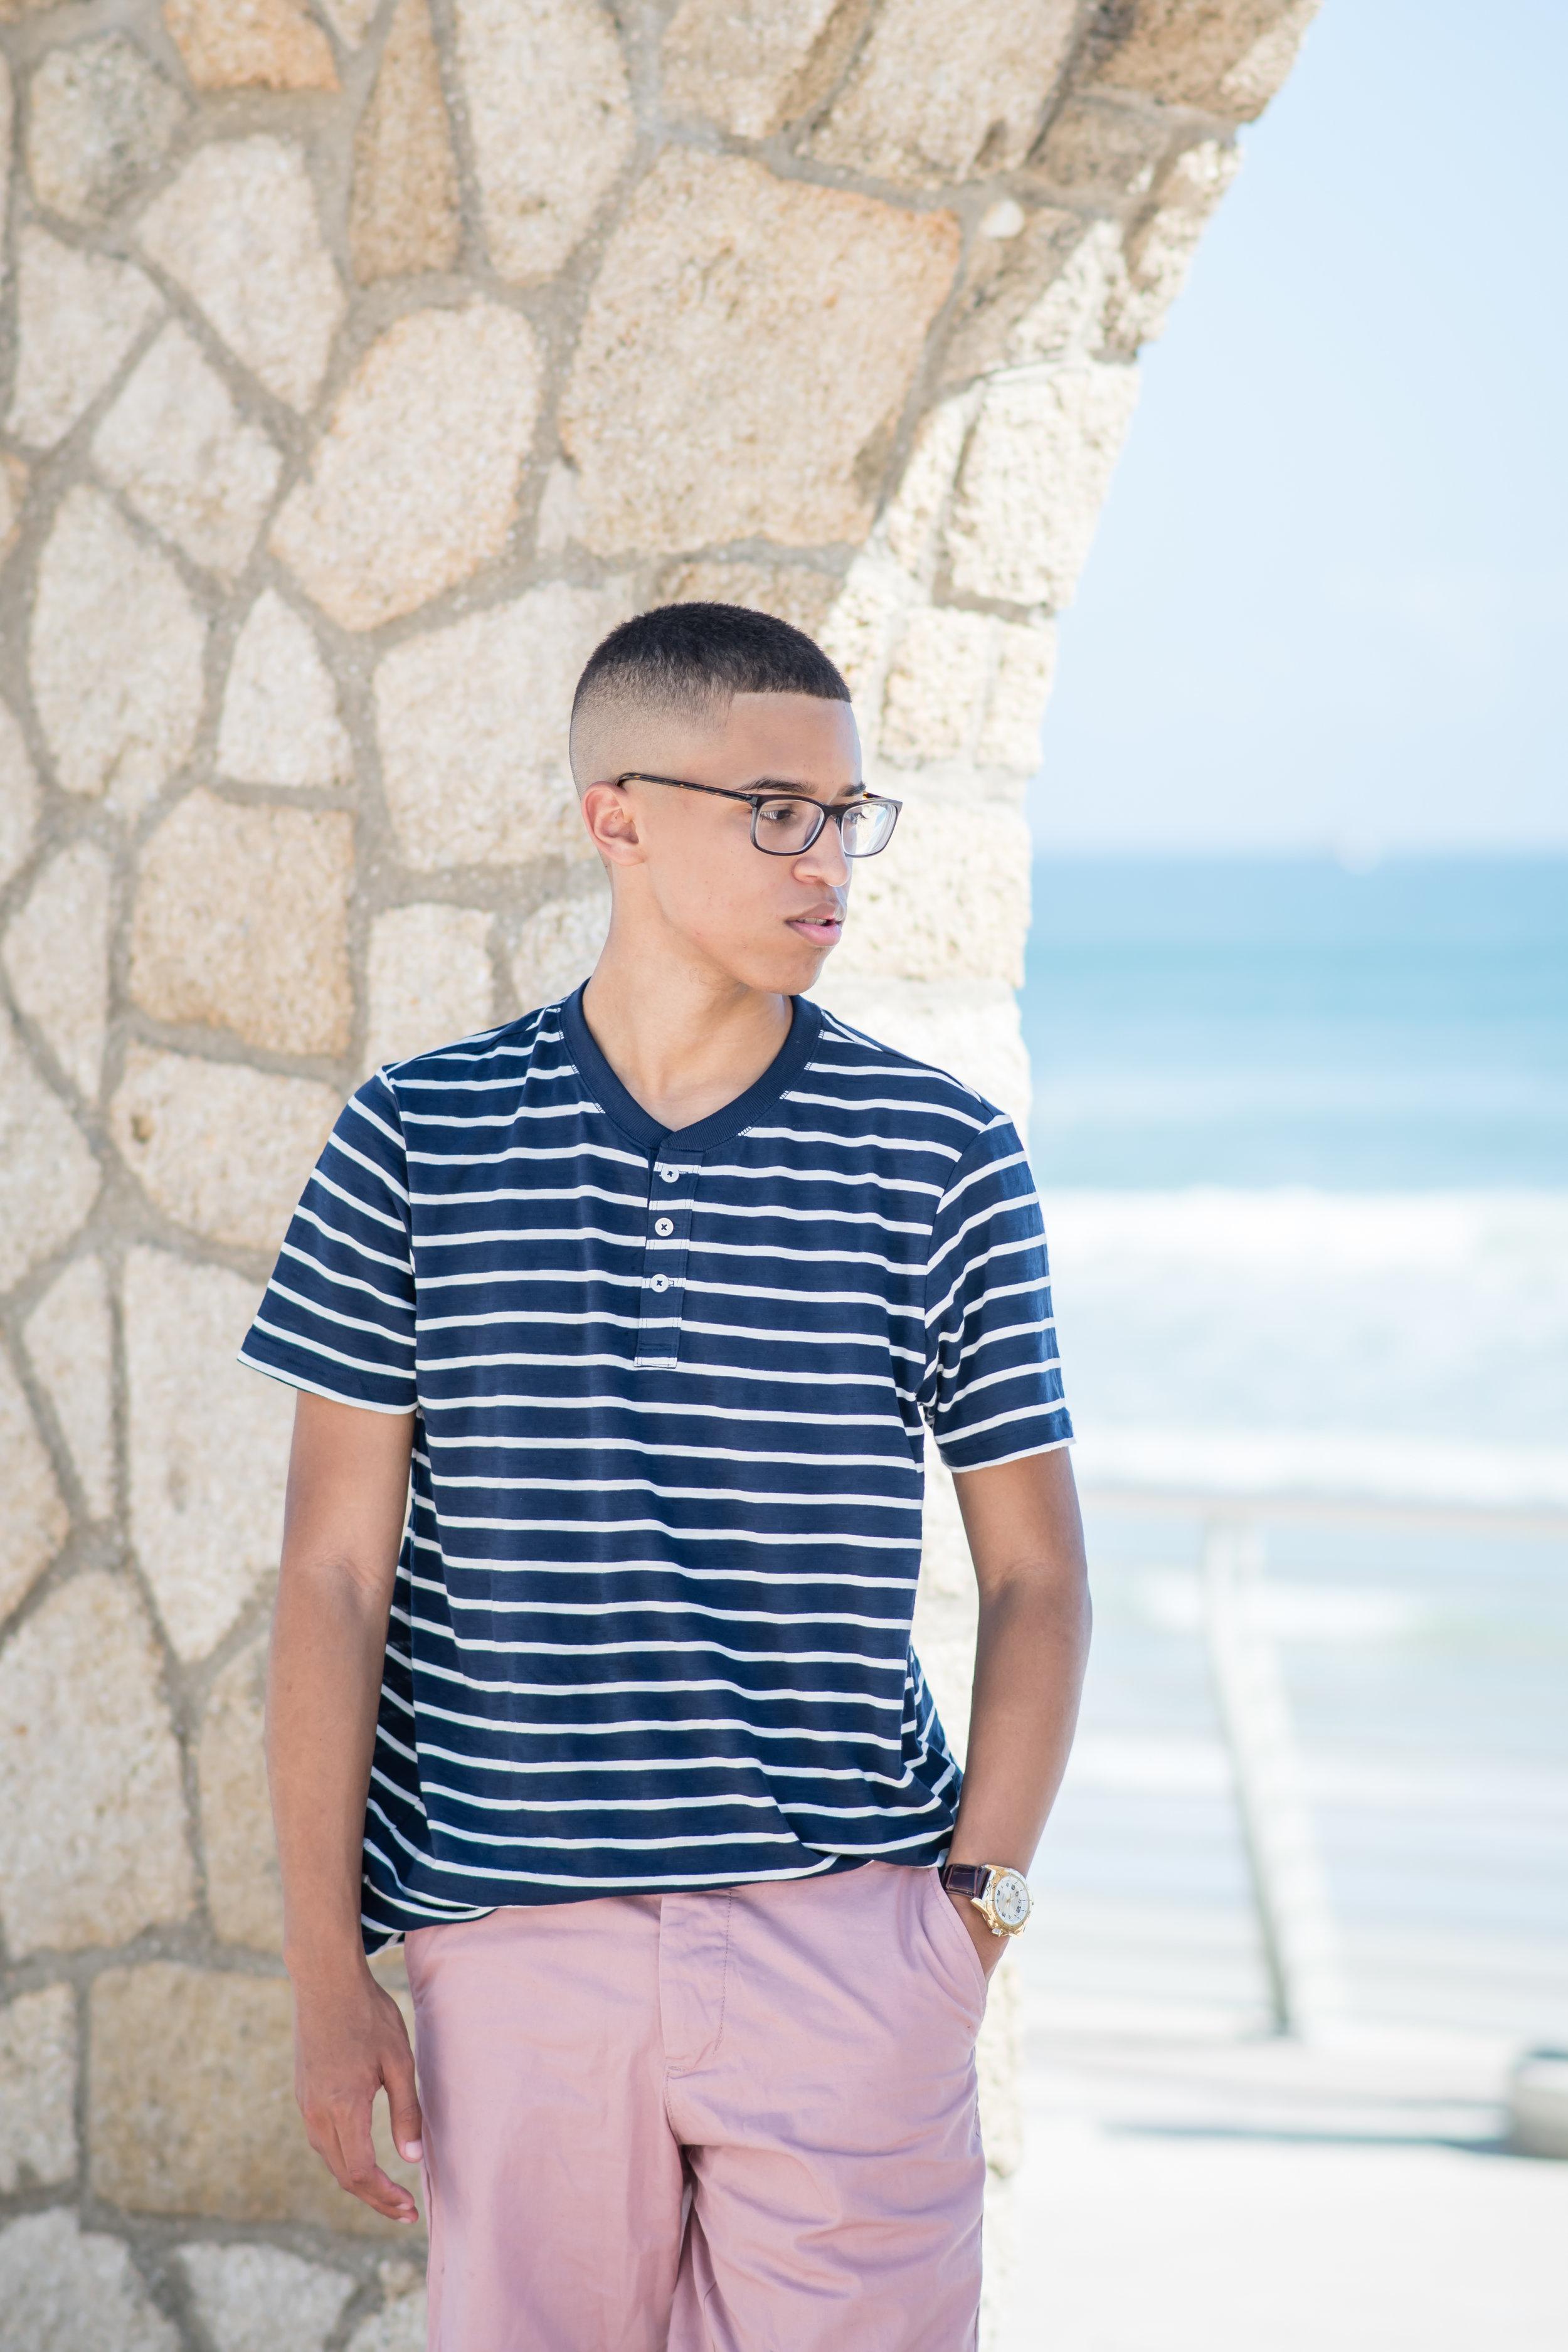 daytona-beach-men-fashion-photos-orlando-photographer-yanitza-ninett-29.jpg